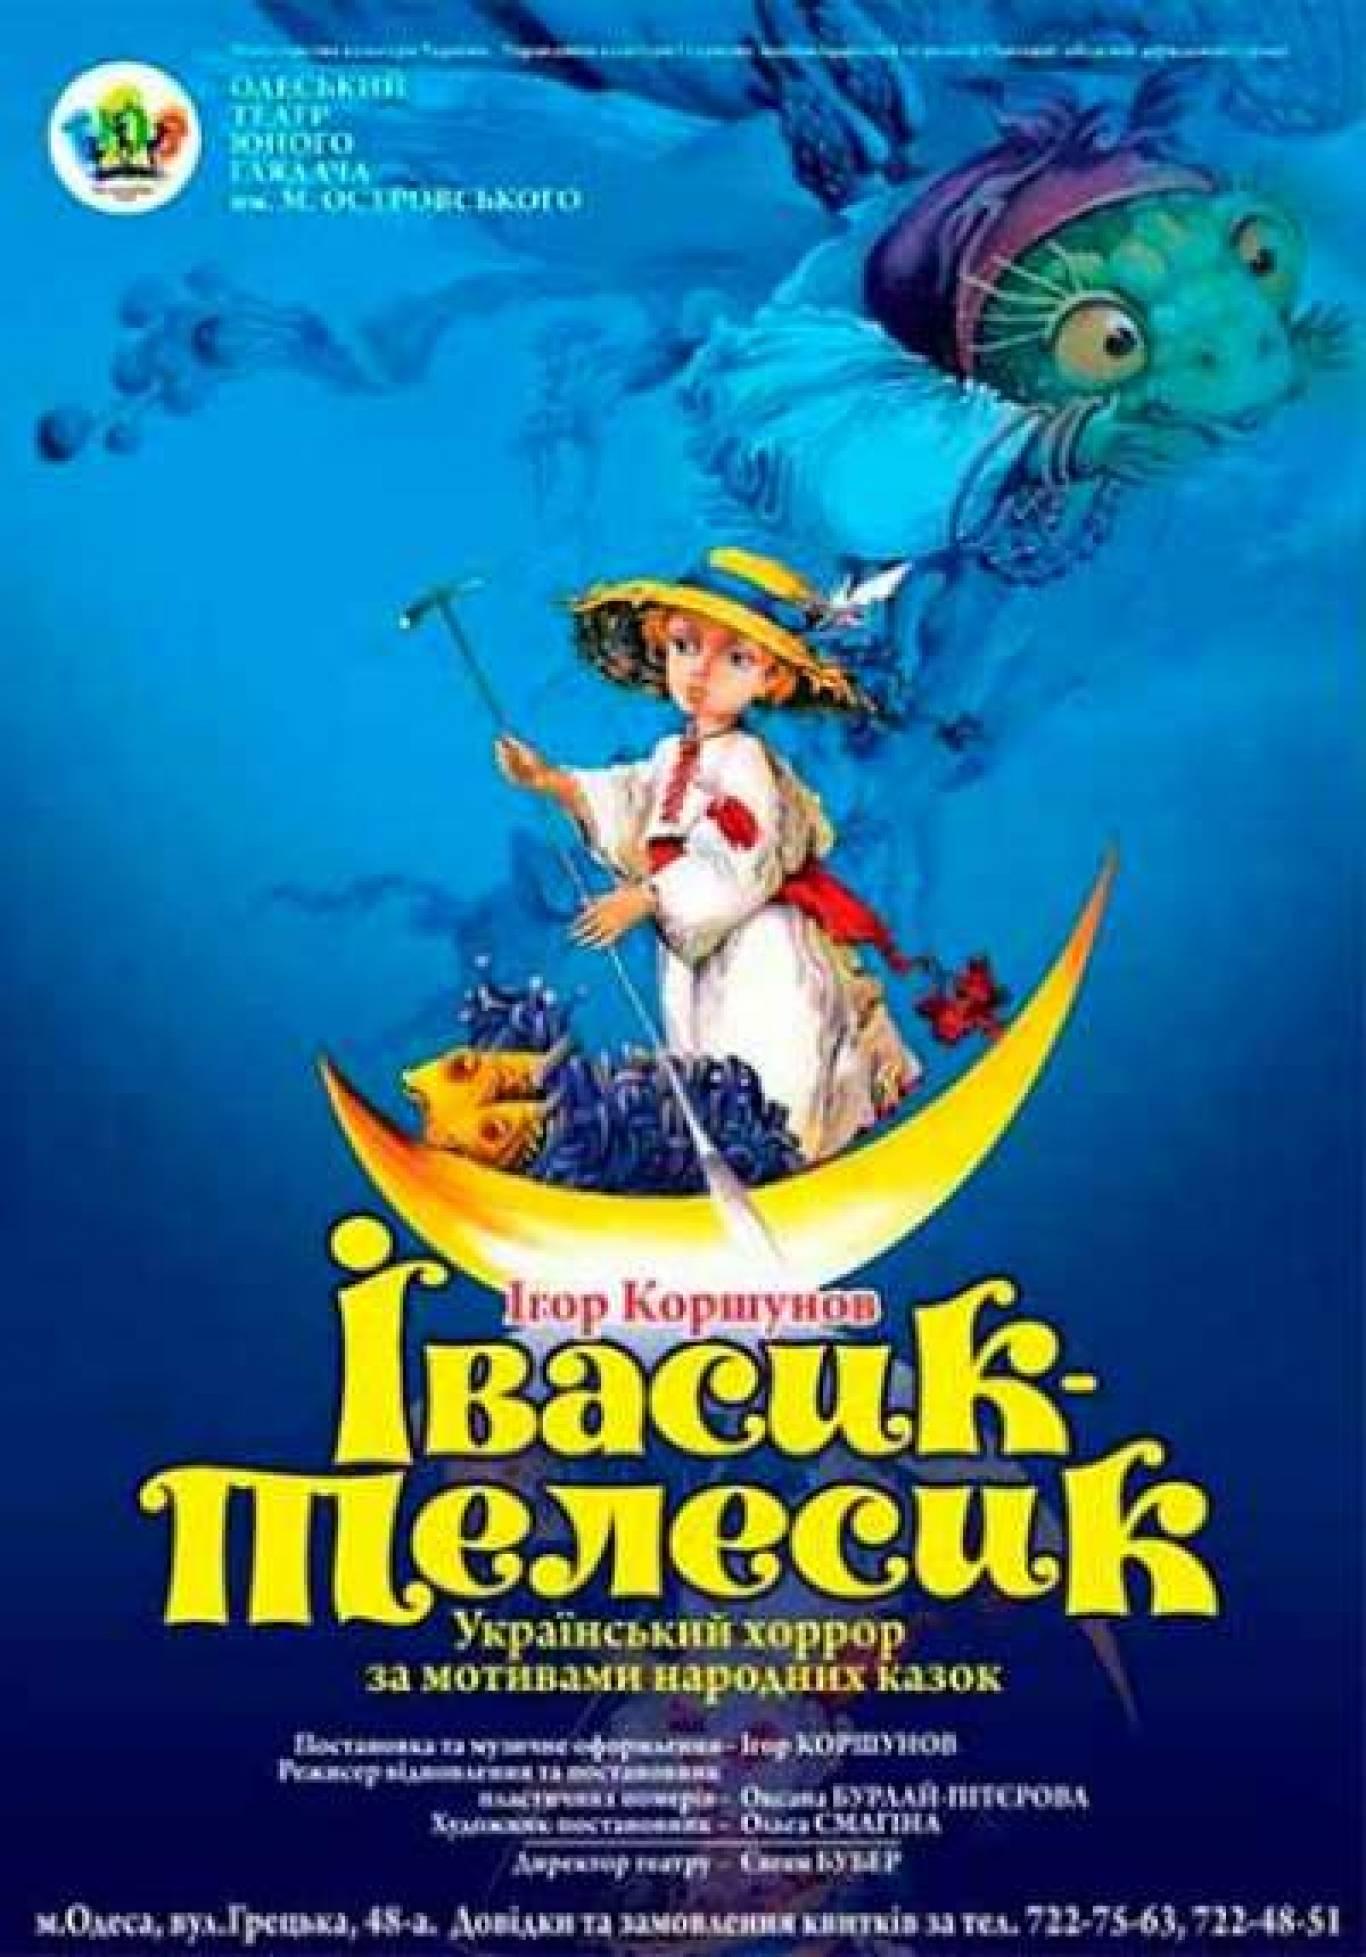 Спектакль Ивасик Телесик